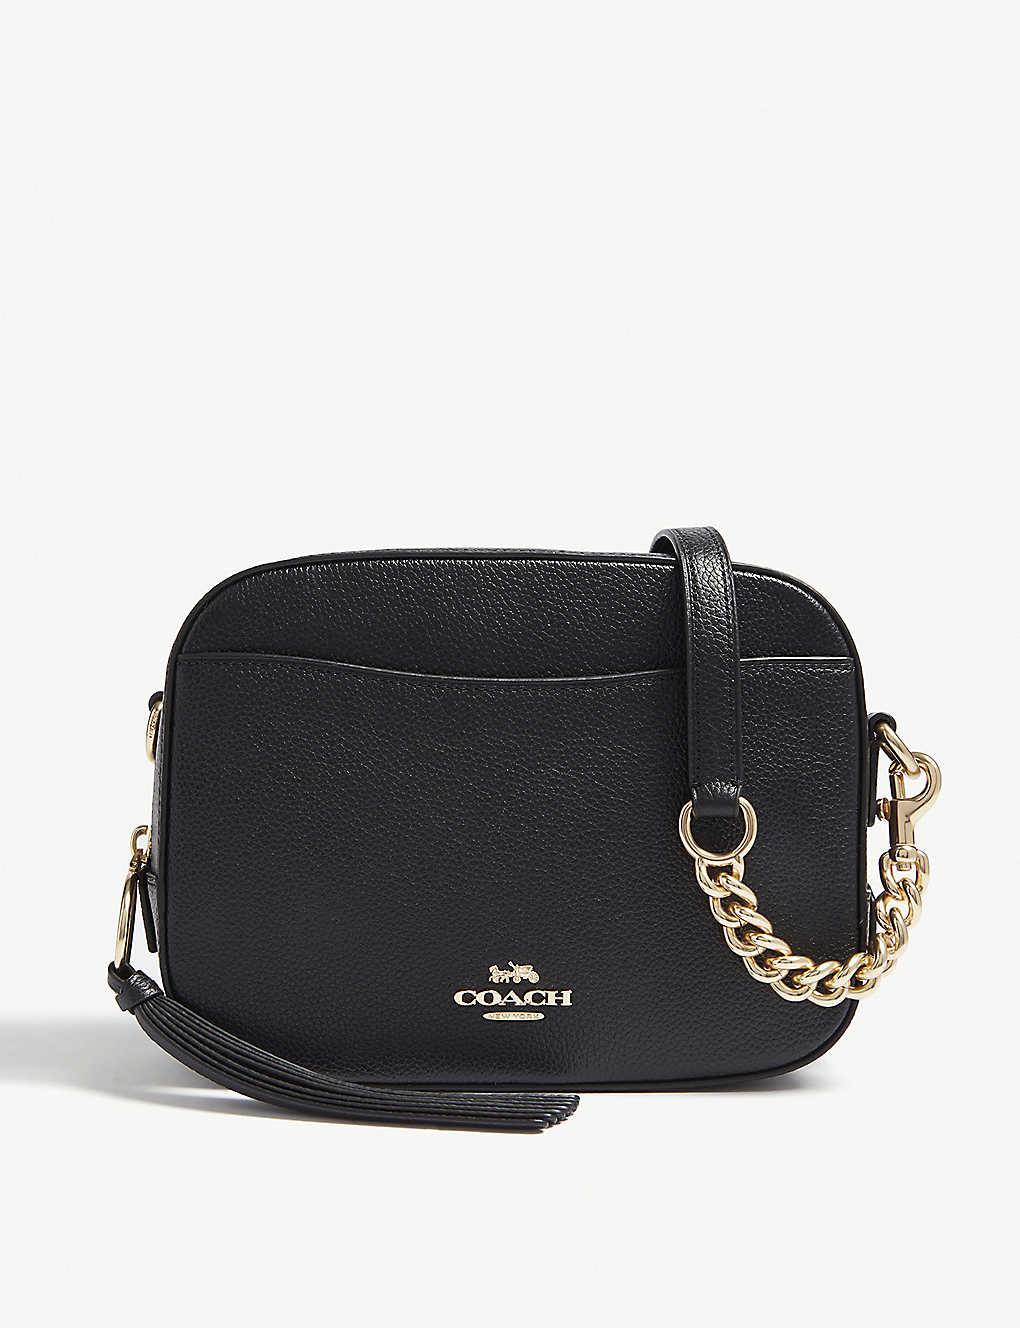 152f569d1 COACH - Leather camera bag | Selfridges.com